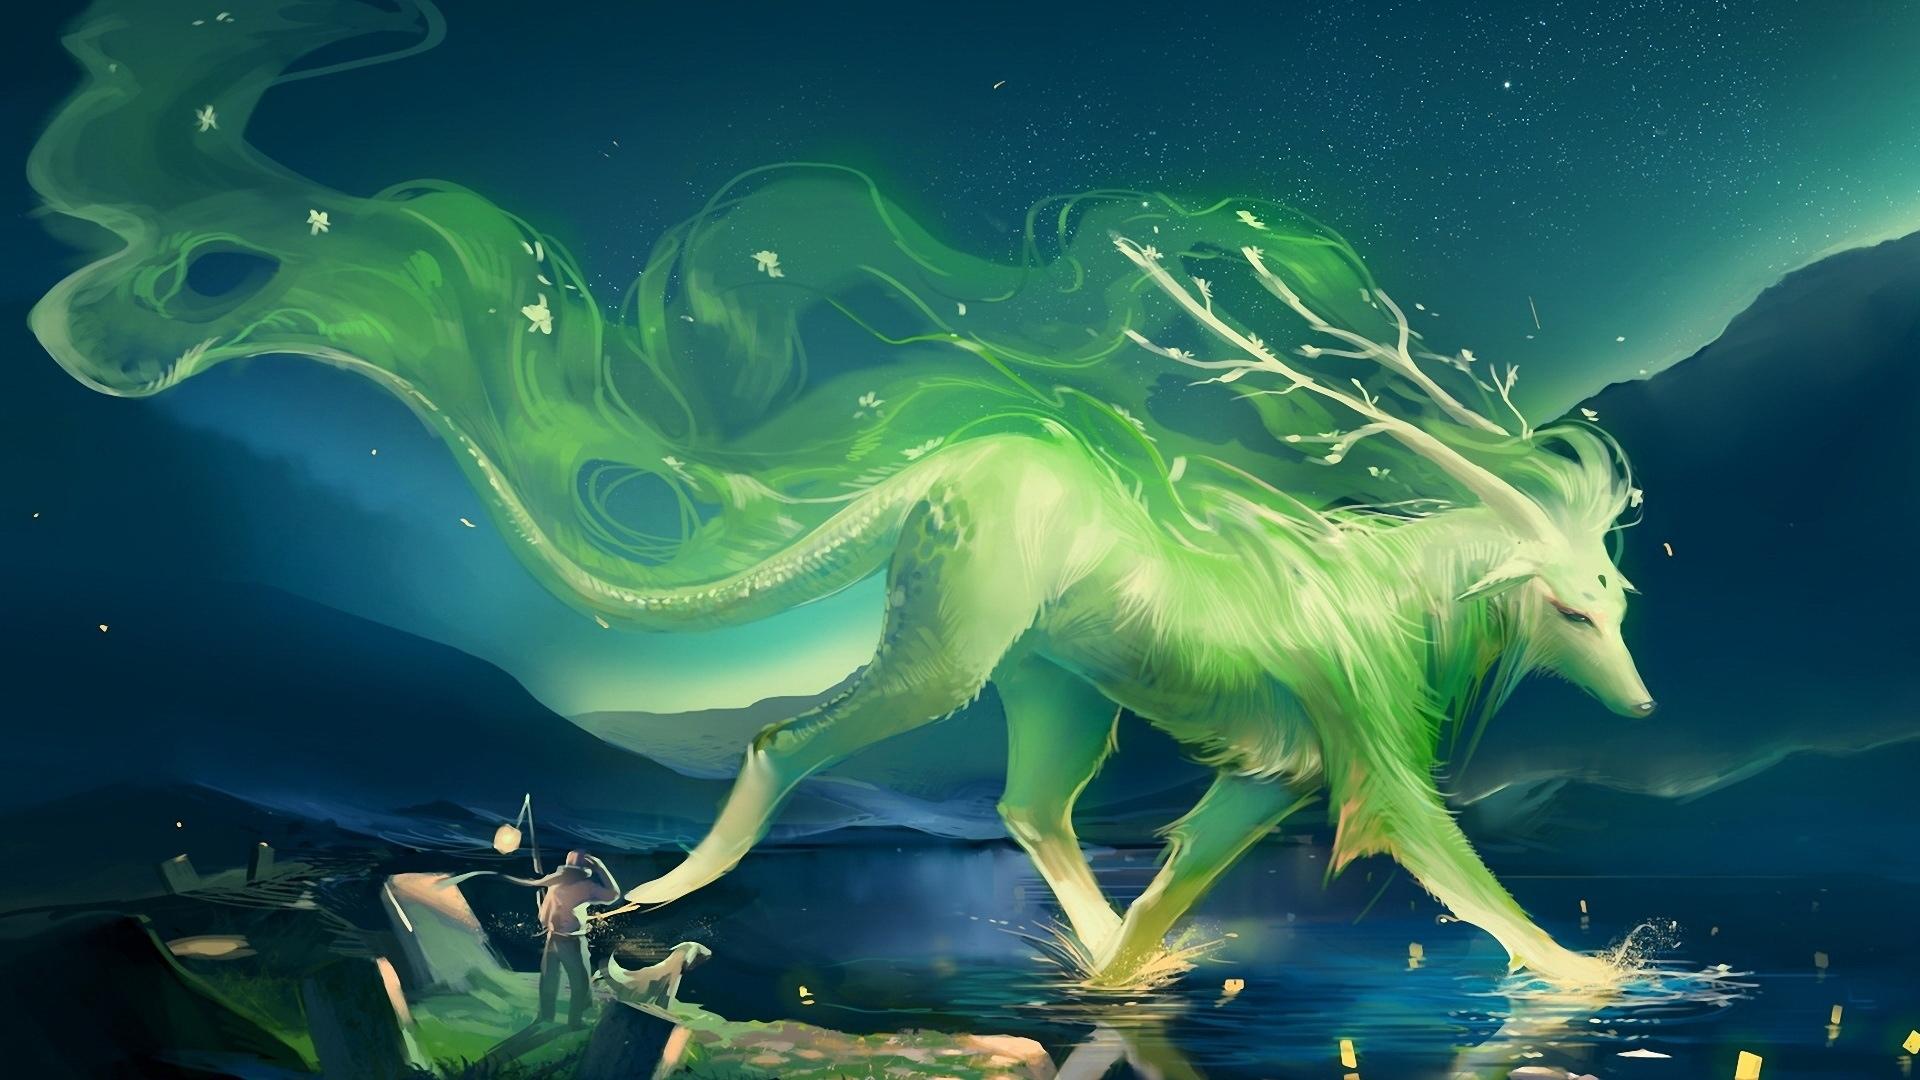 fantasy pictures | Fantasy Anime Wallpaper Hd 1920×1080 #22842 HD